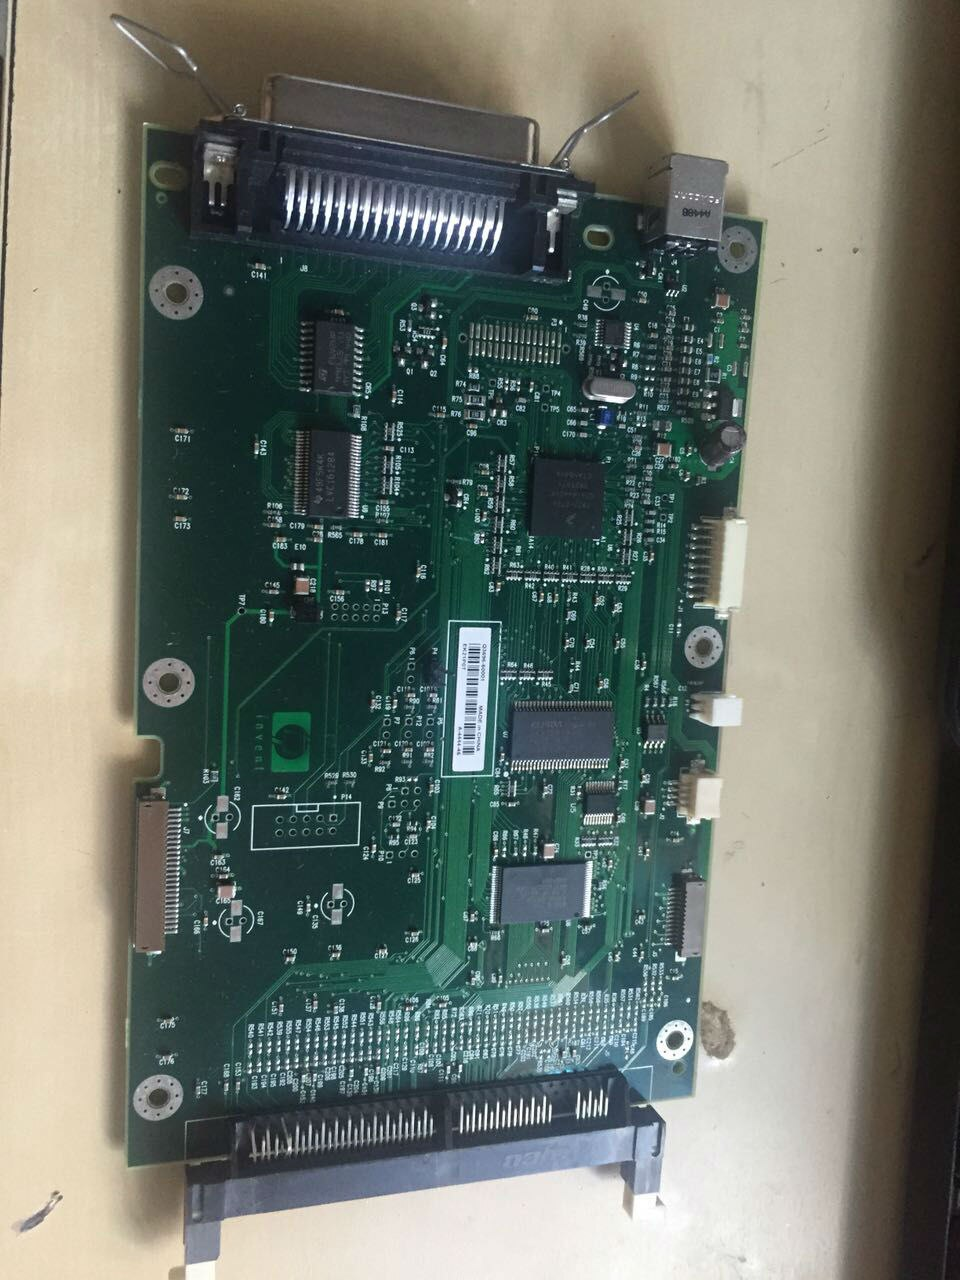 Q3696-60001 Q3696-67901 CB355-67901 ل HP LaserJet 1320 المنسق مجلس الجمعية USB استخدام printerd طابعة أجزاء